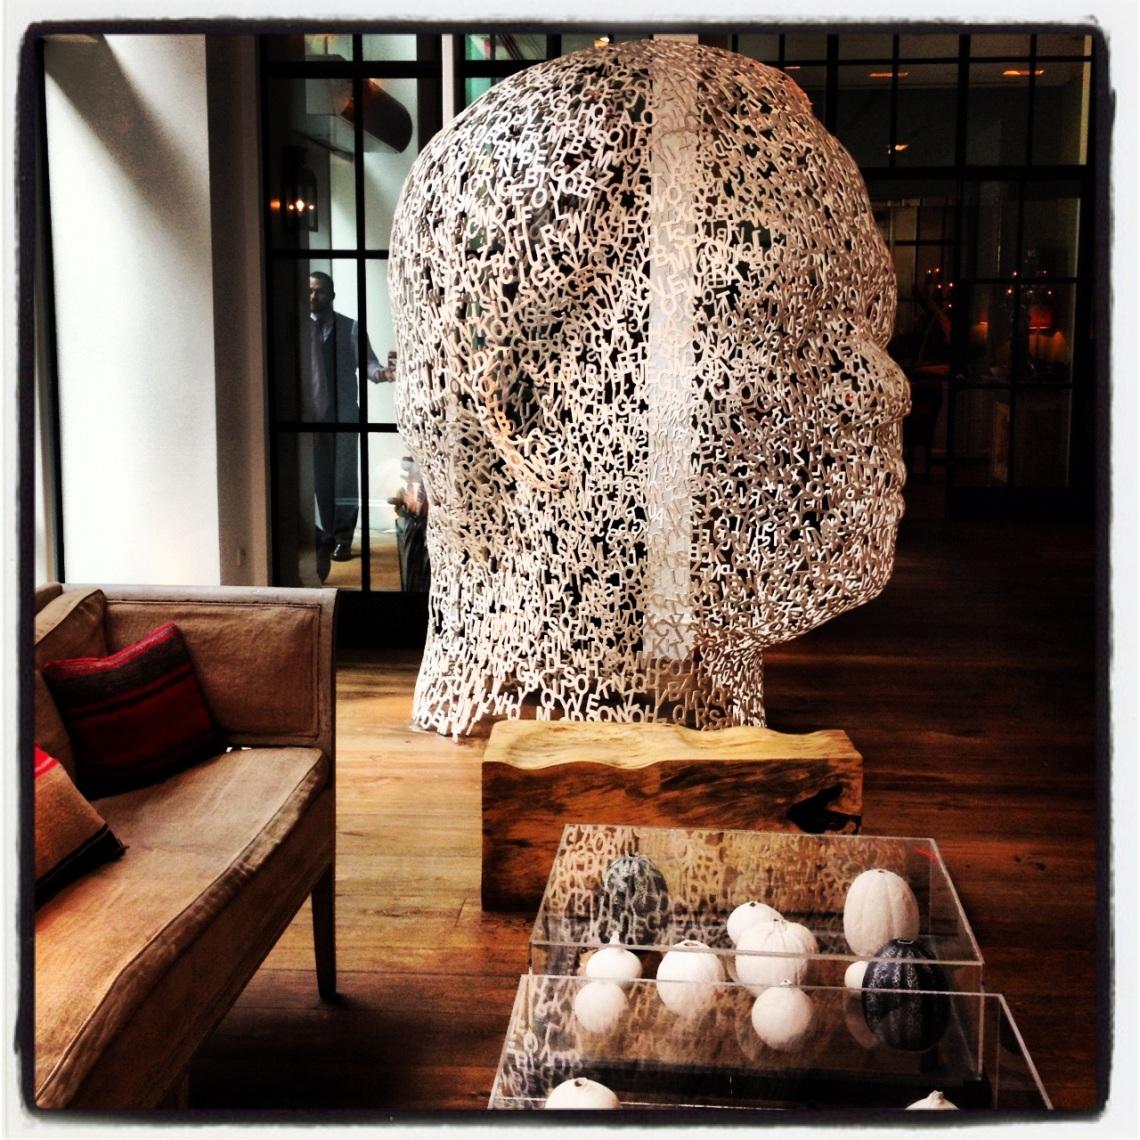 Lobby Crosby Street Hotel - Jaume Plensa steel sculpture